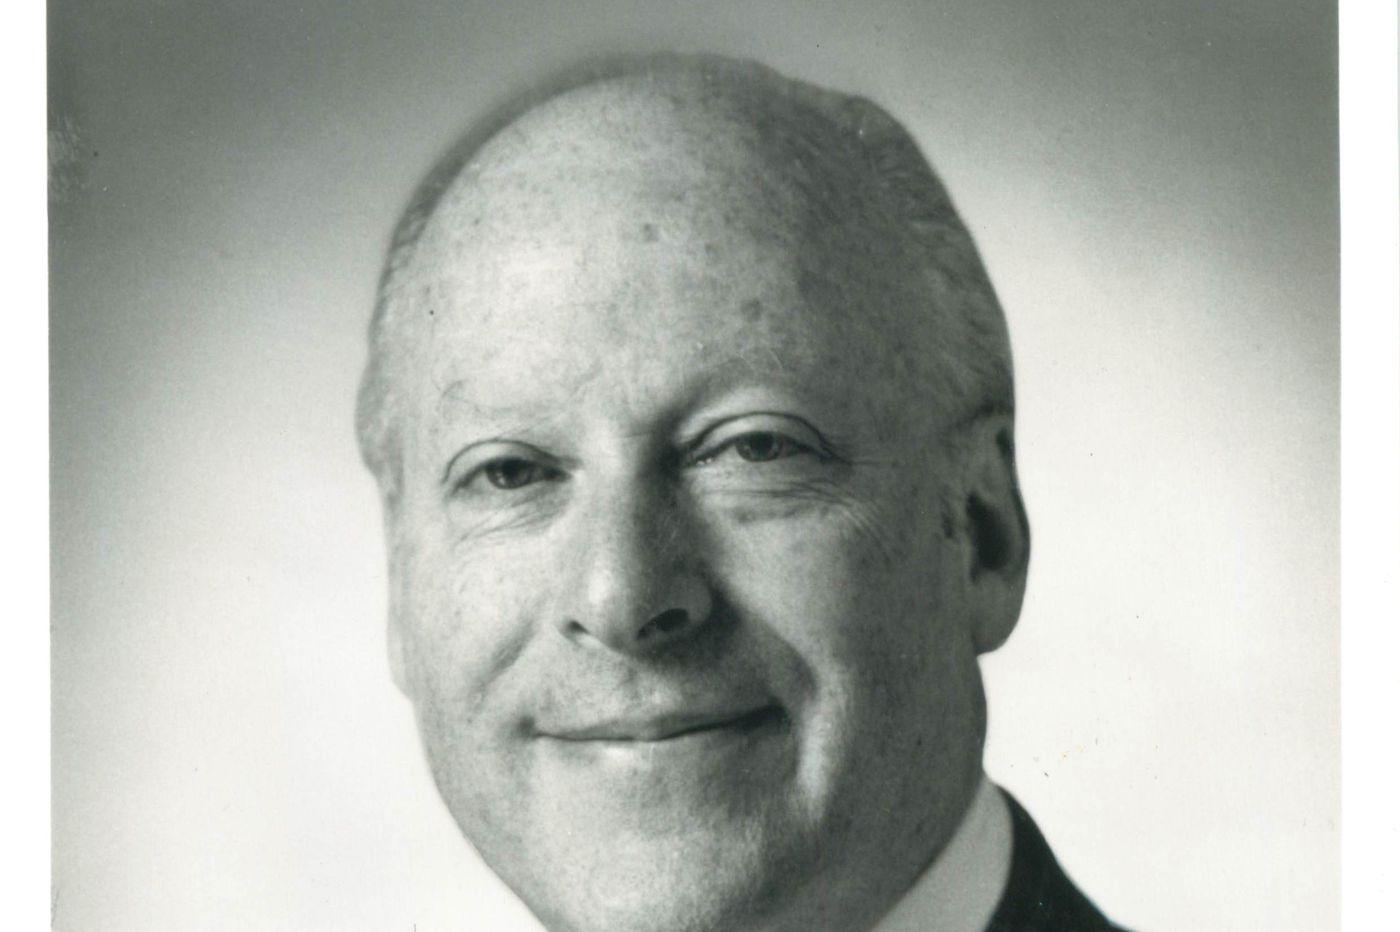 Joseph M. Segel, 88, founder of QVC and Franklin Mint, dies